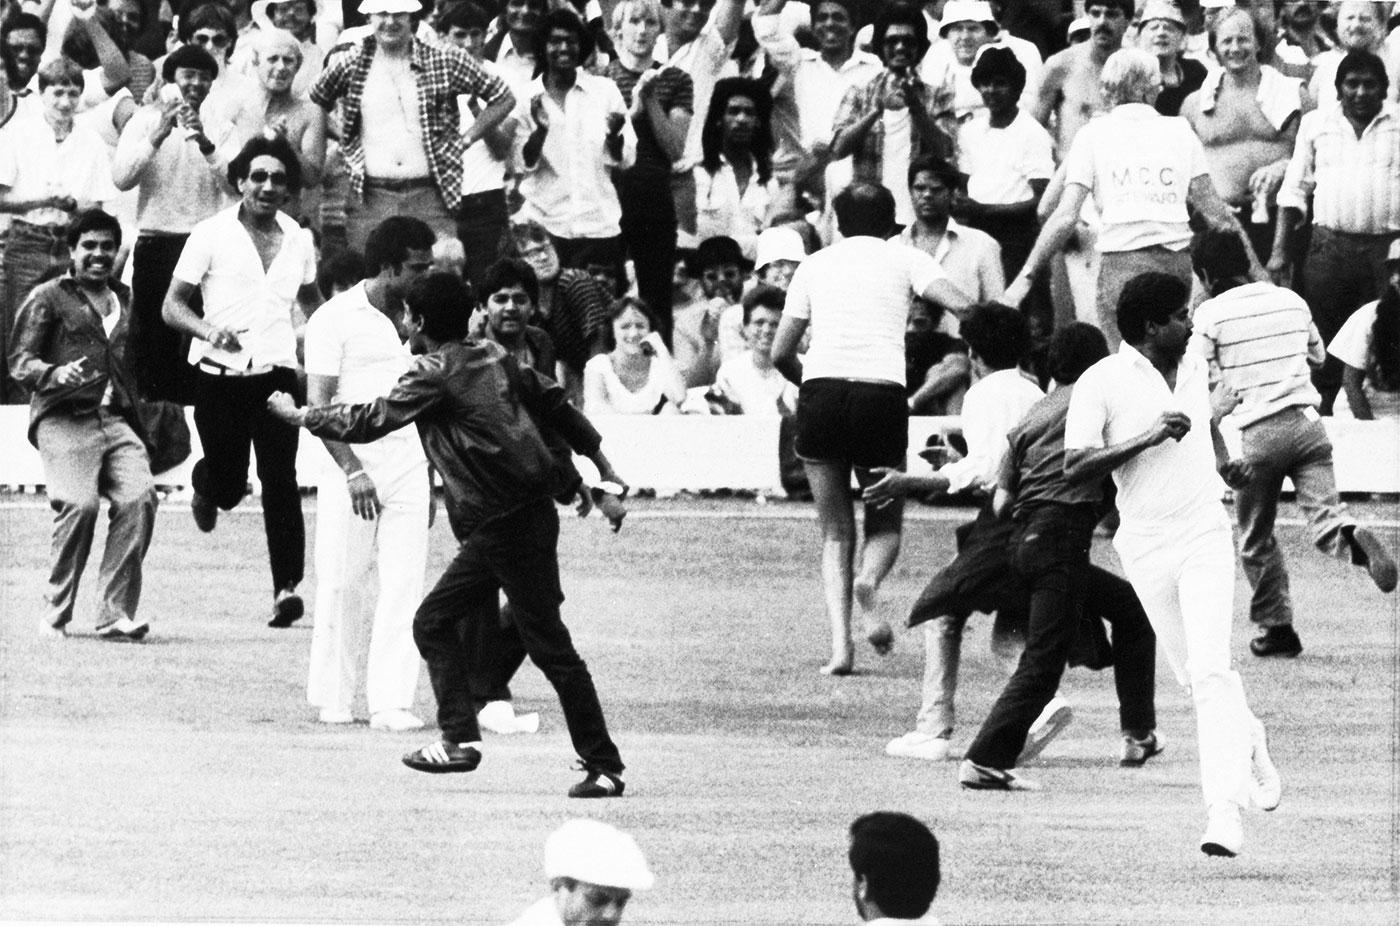 Fans run on to the field to celebrate Kapil Dev's catch to dismiss Viv Richards